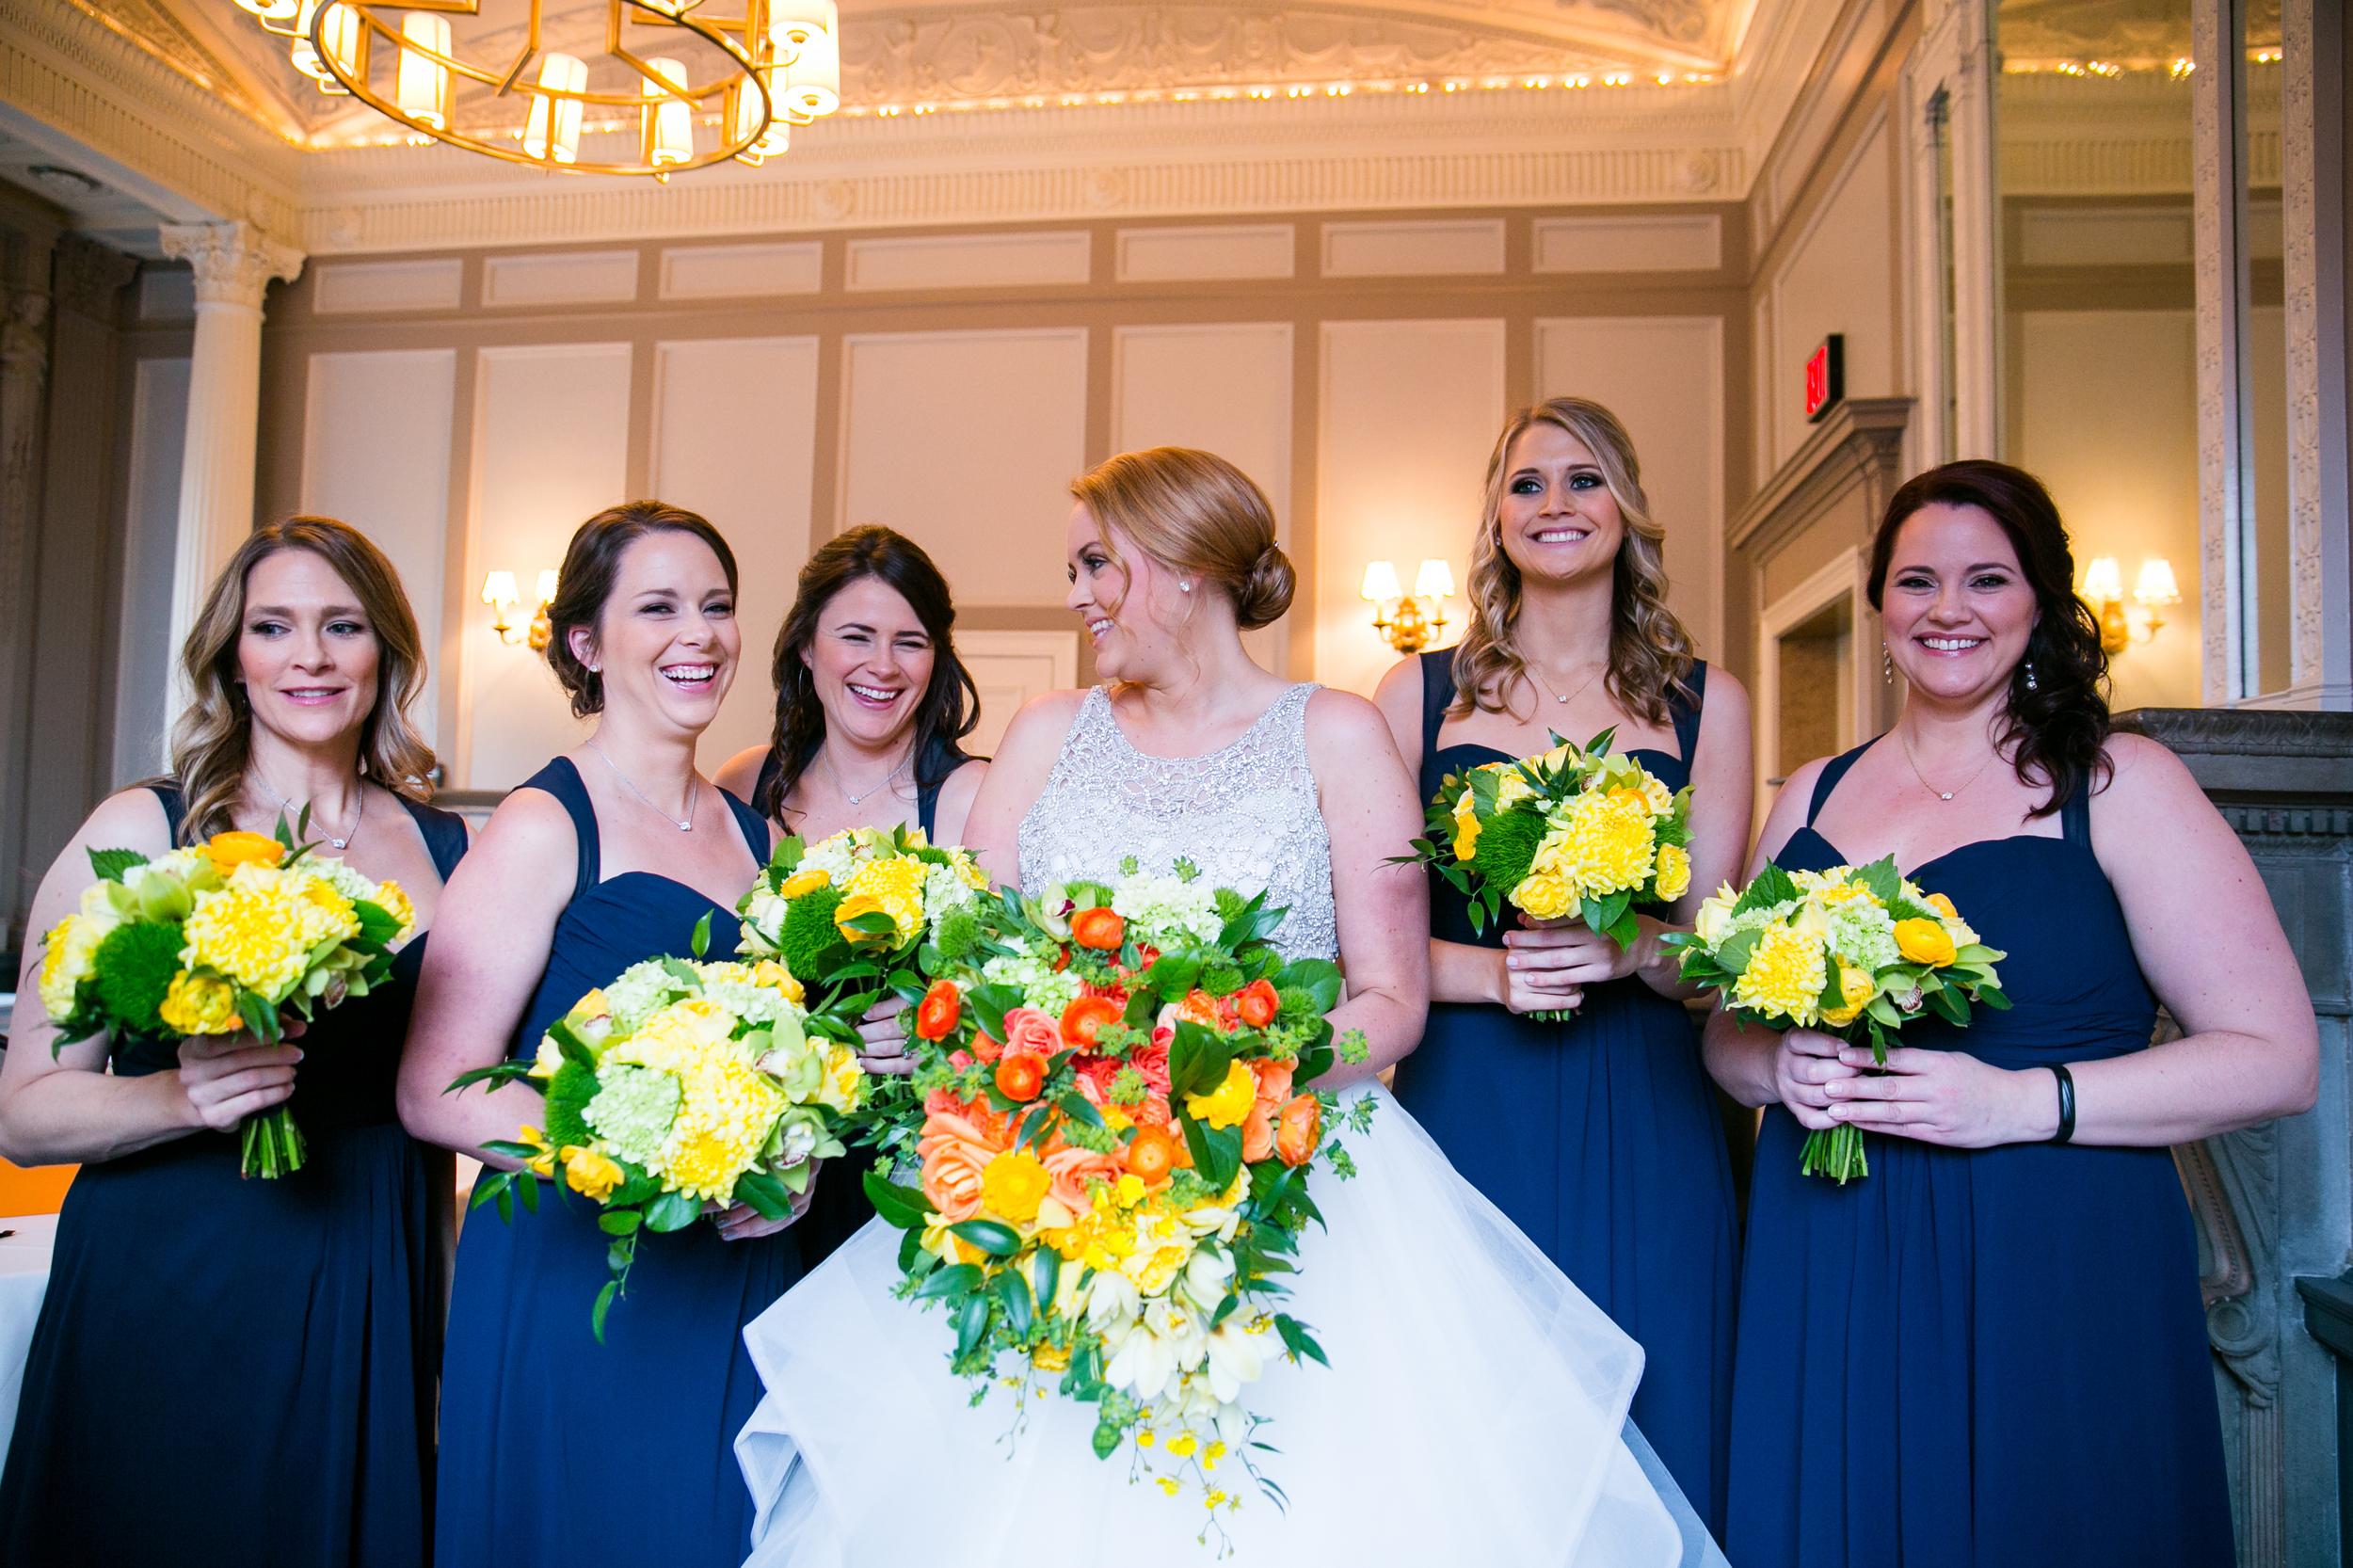 Bridalbliss.com   Portland Wedding   Oregon Event Planning and Design   Powers Studios   Zest Floral